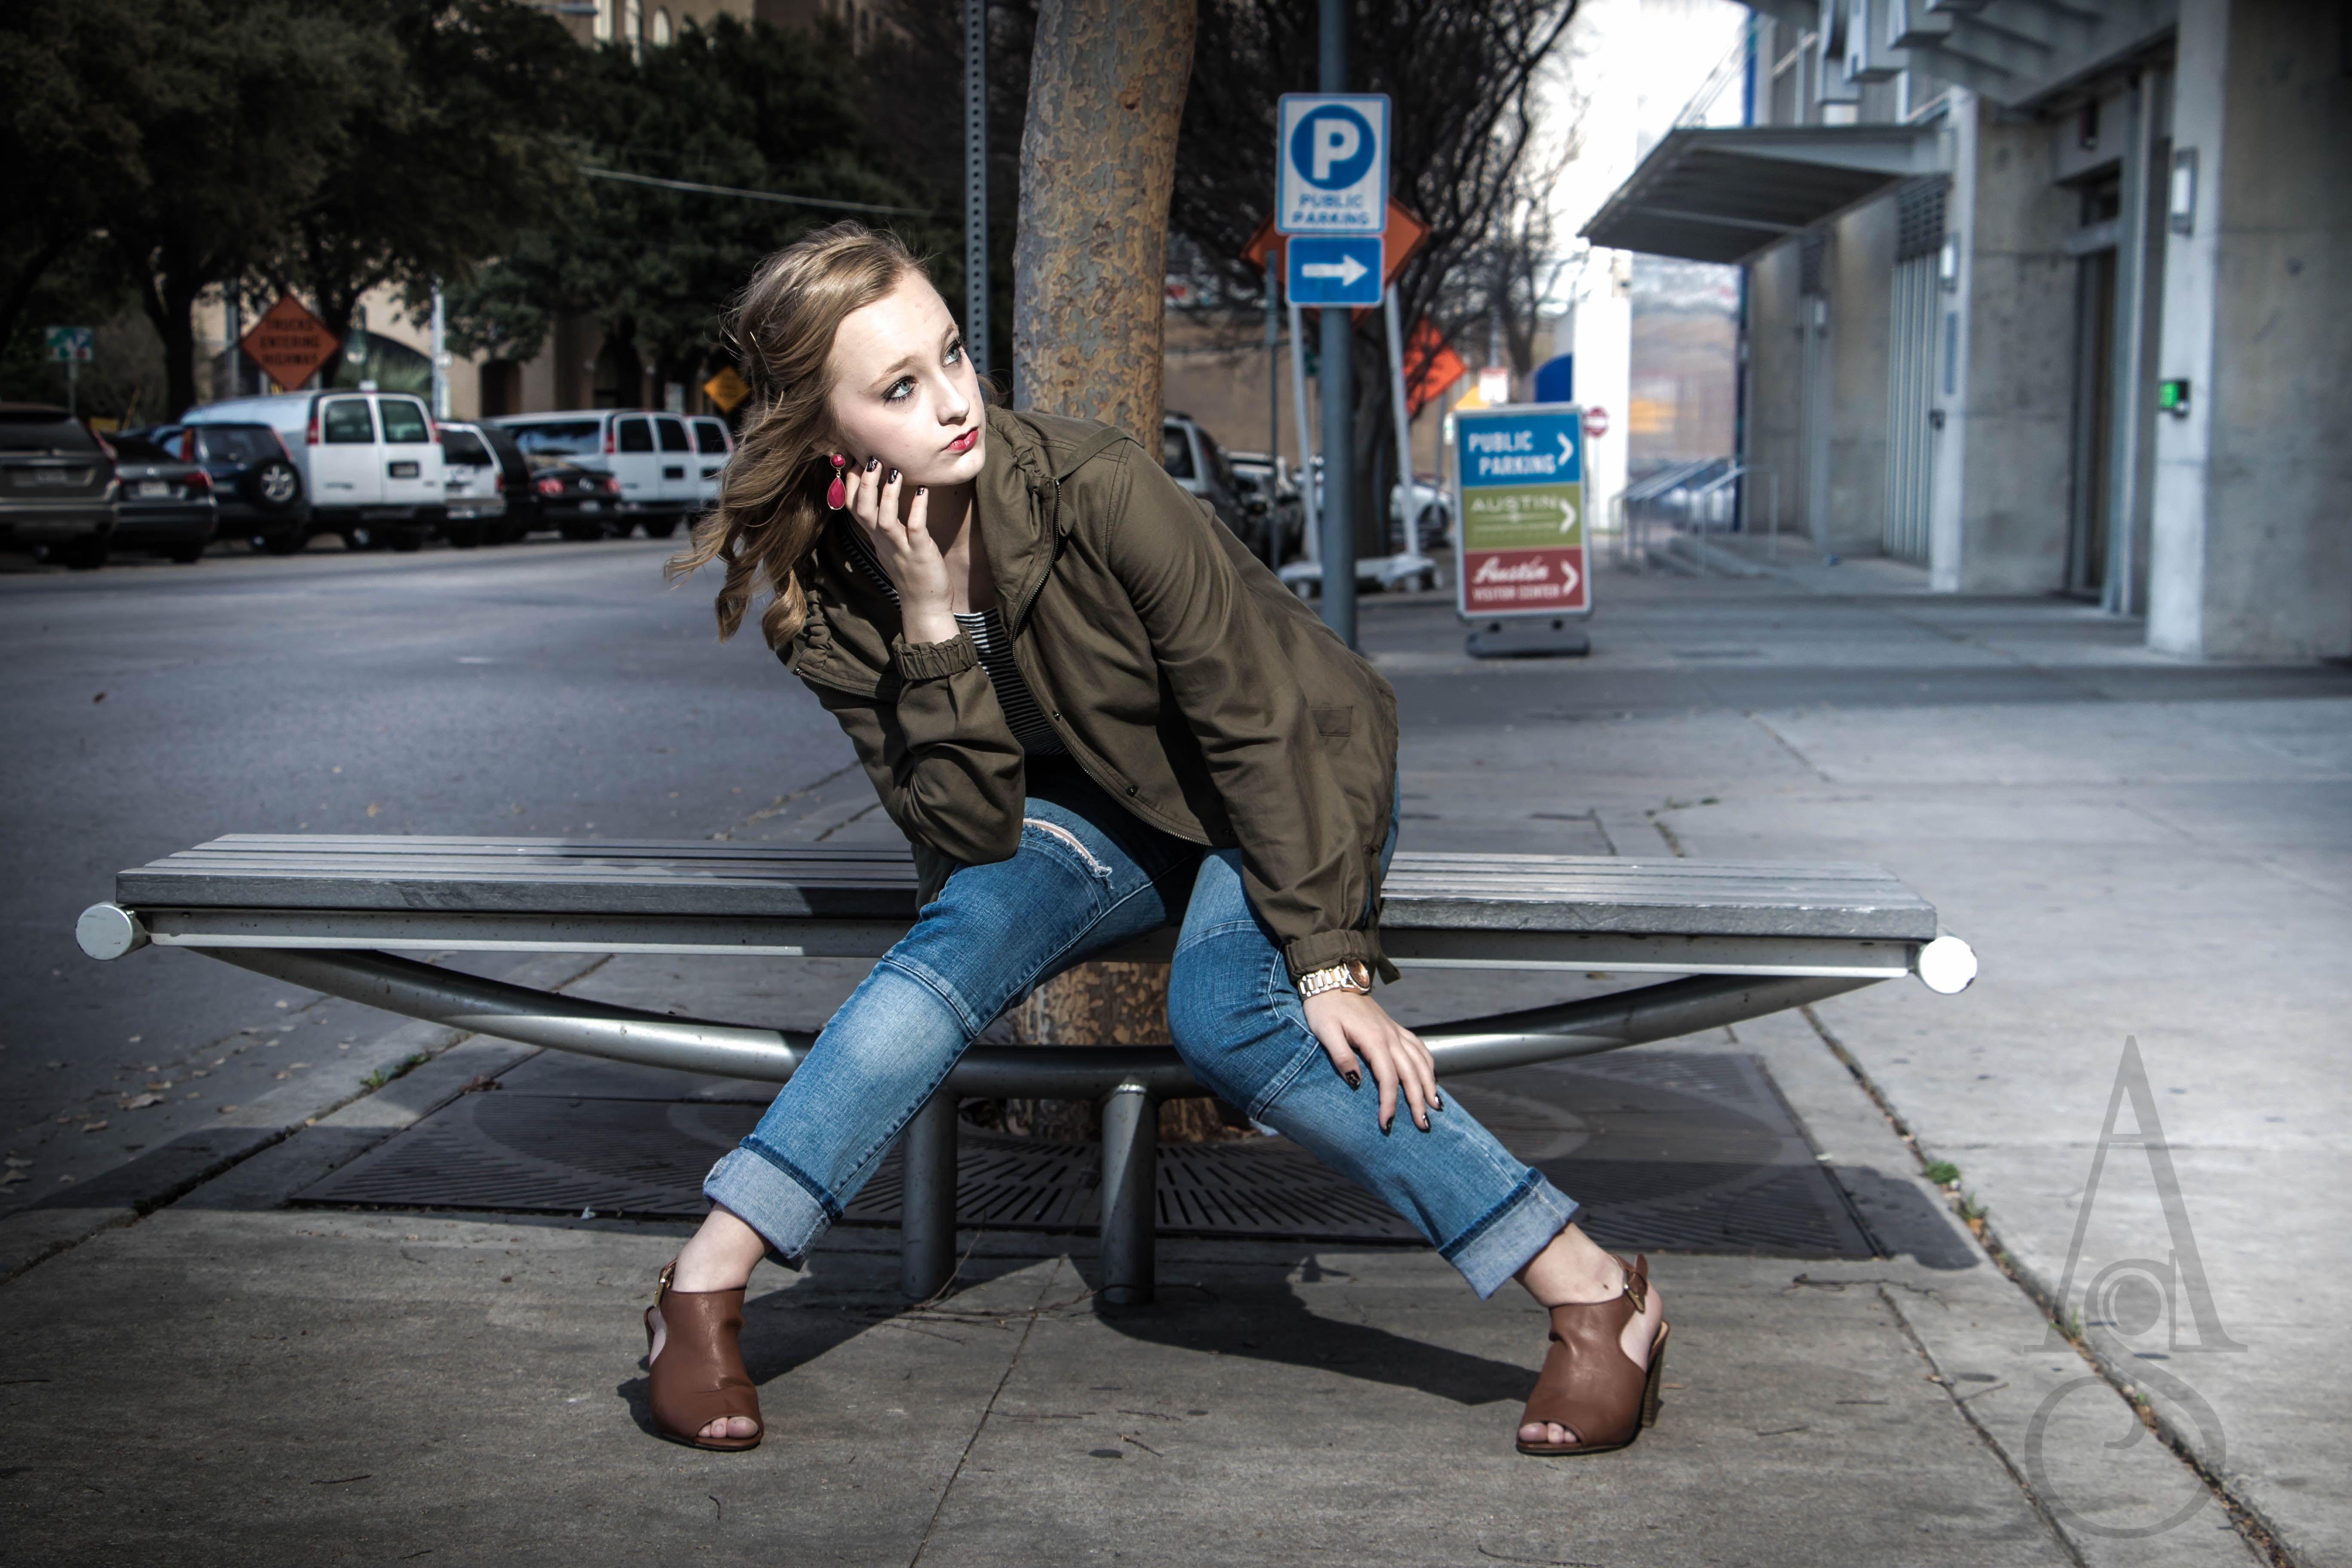 Senior Portrait #admyerstudios #senior #photography #atx #downtown #5thst #armyjacket #denim #model #modern #city @abigailillian  www.admyerstudios.squarespace.com